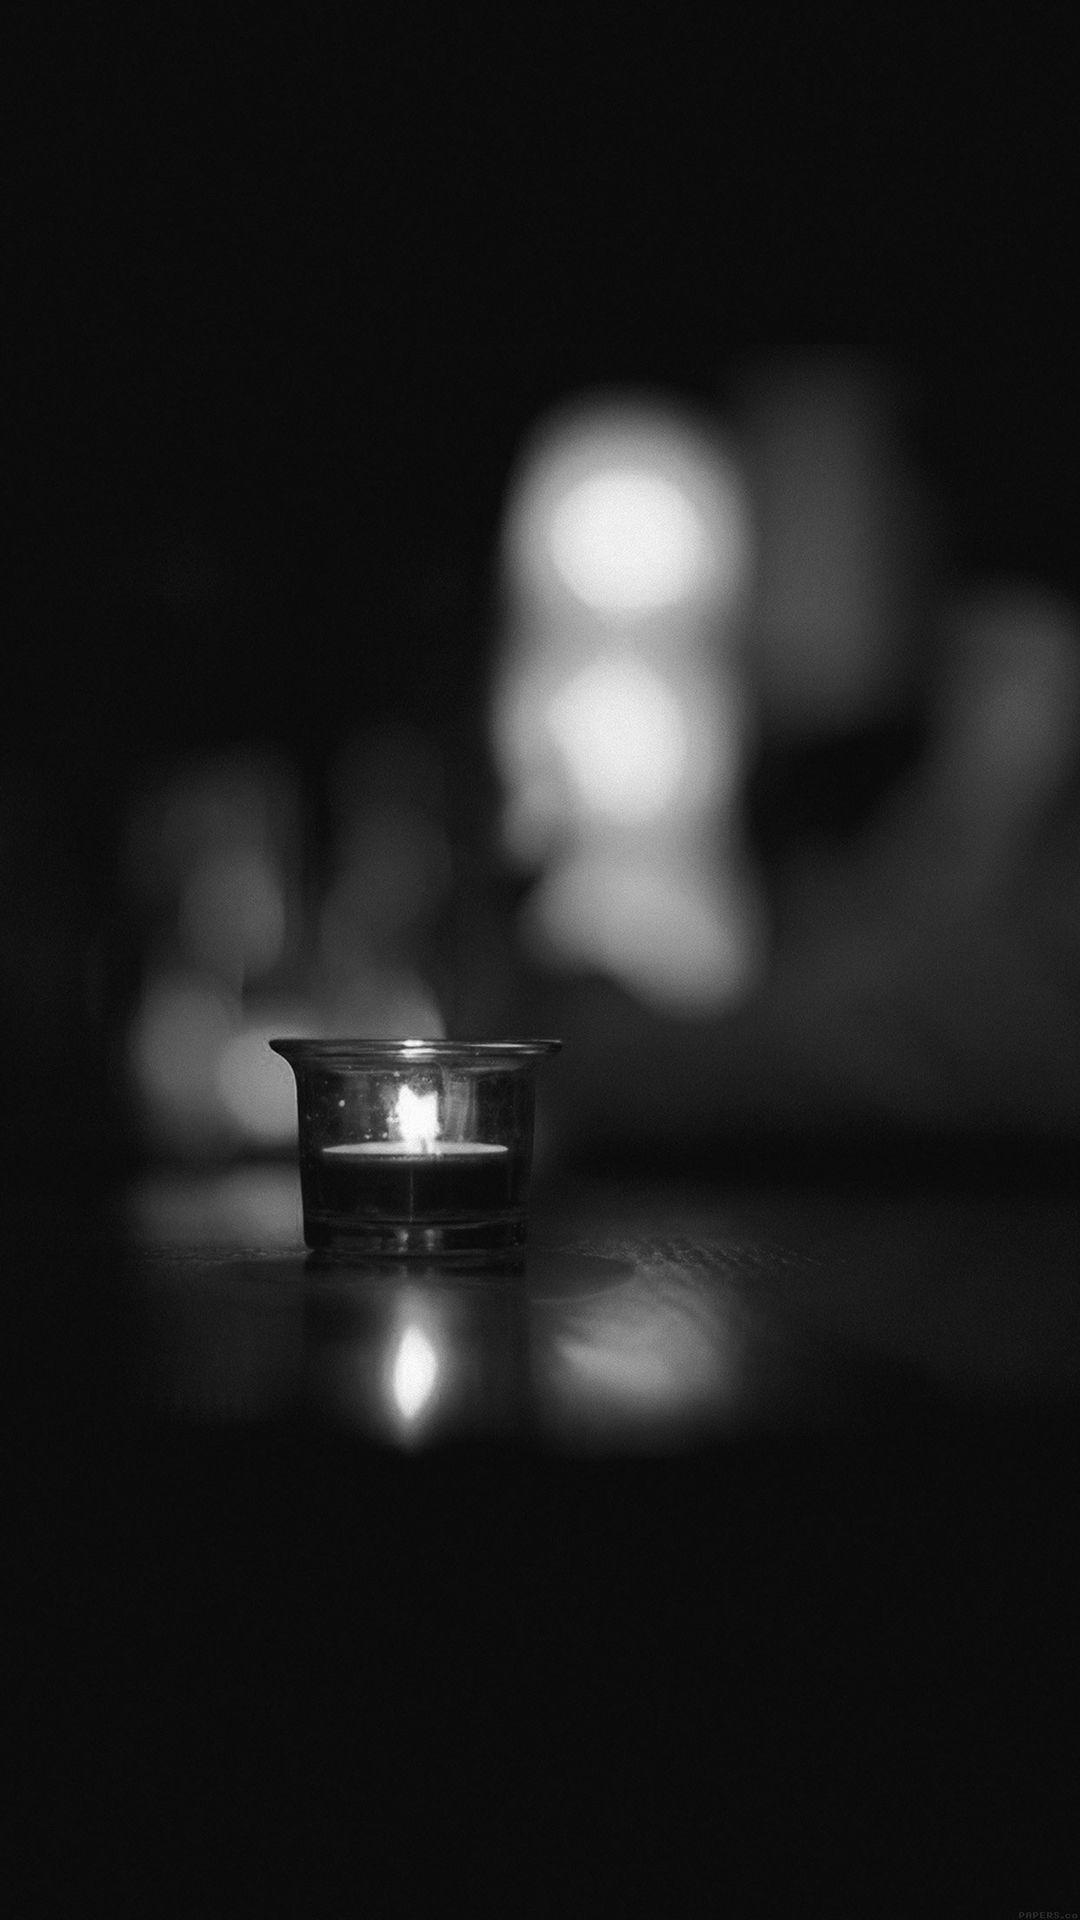 Candle Light Night Bw Bokeh Romantic Iphone 6 Plus Wallpaper Iphone Light Grey Wallpaper Iphone Candles Wallpaper